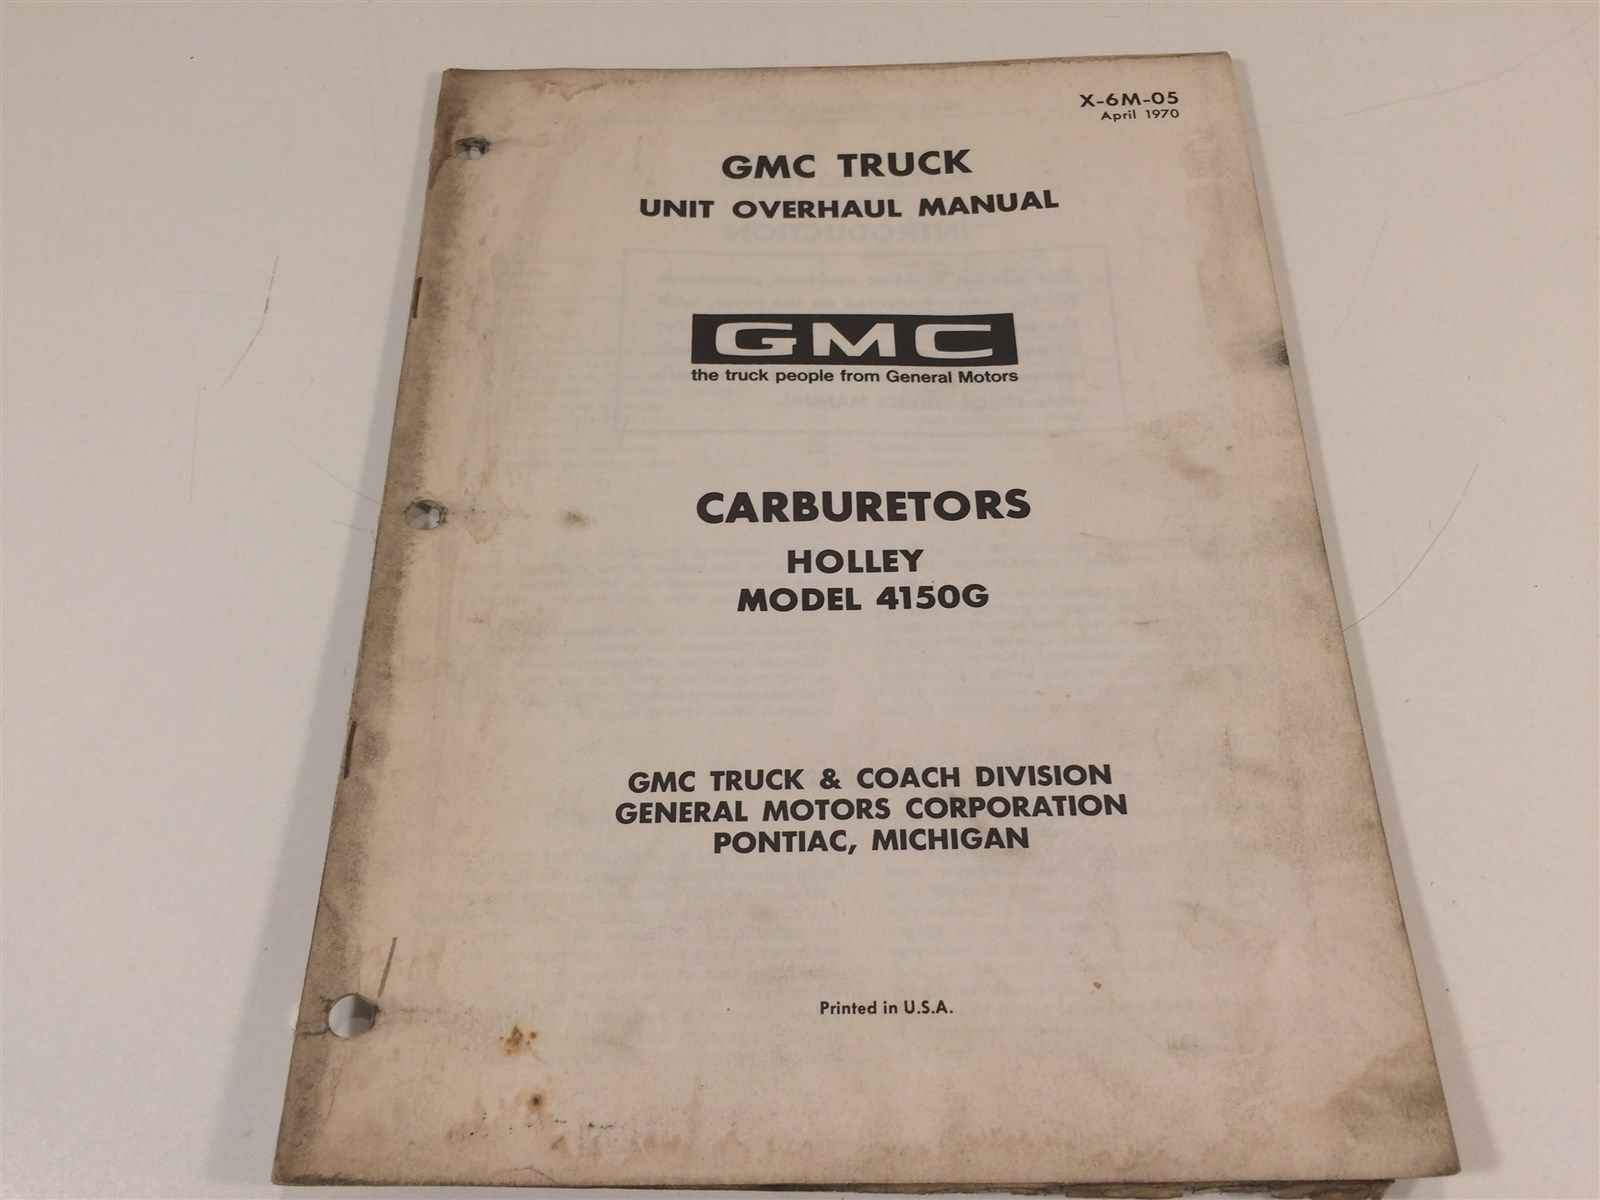 1970 GMC Truck Unit Overhaul Manual X-6M-01 Carburetors Rochester  B 2G 2GV 4G